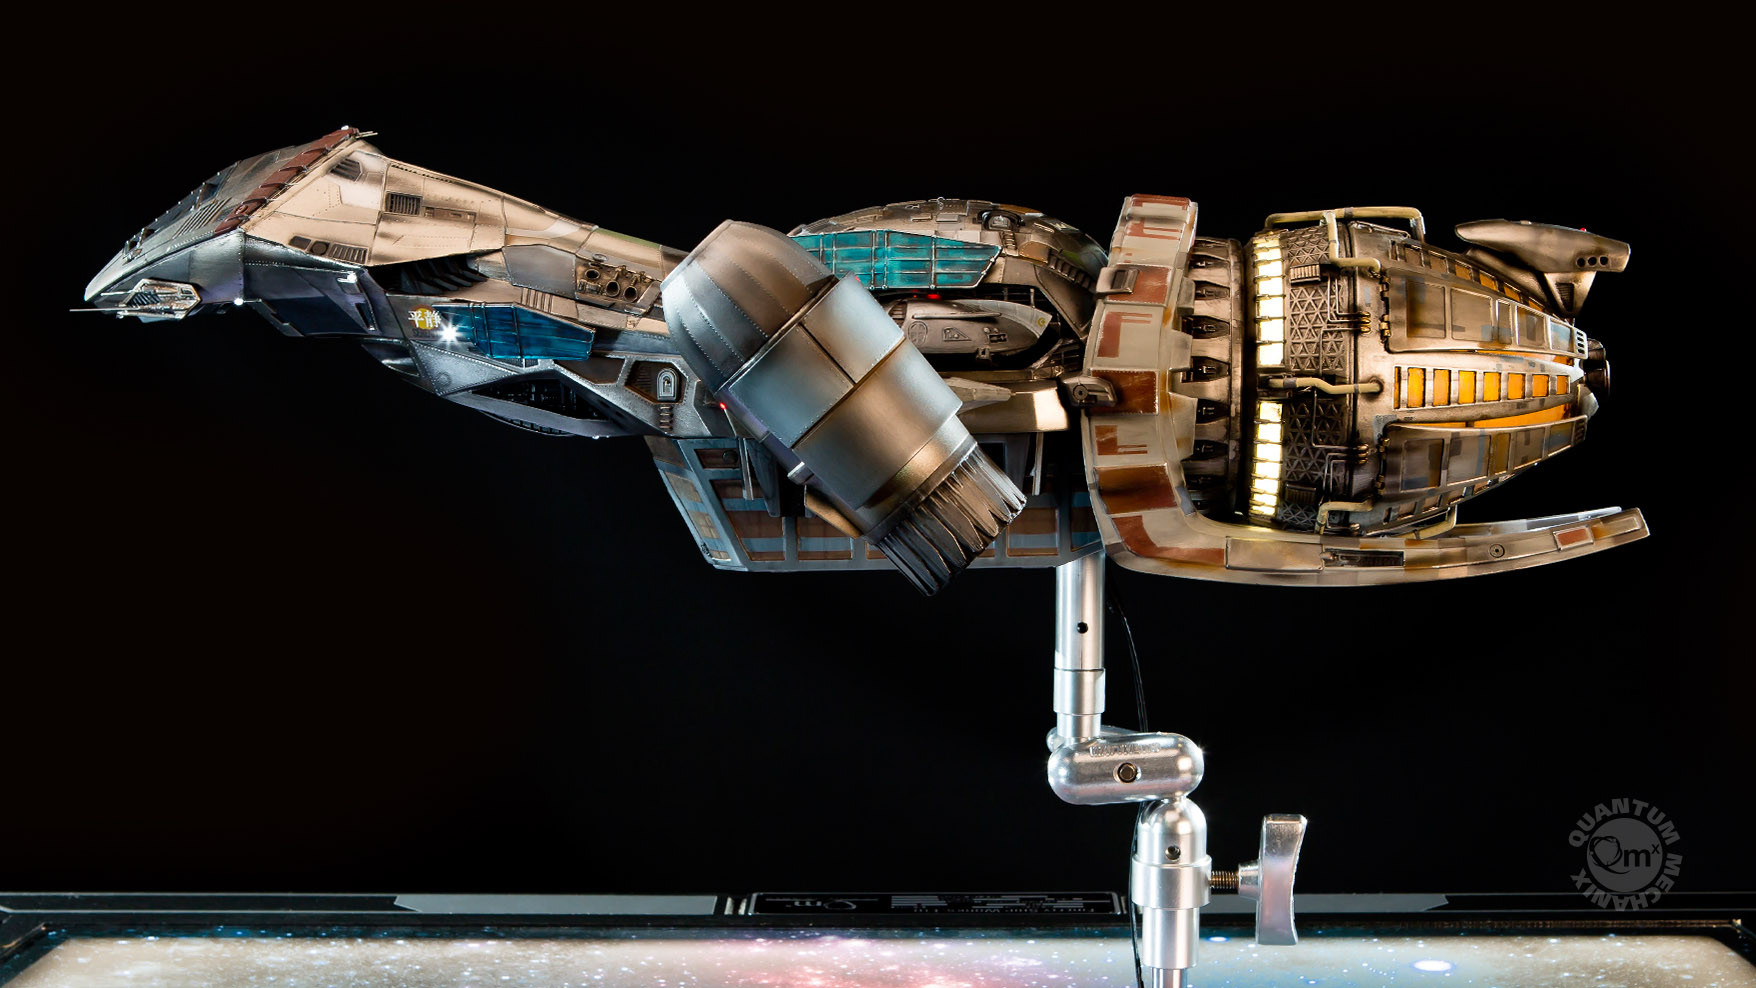 Firefly Serenity Film Scale Artisan Replica